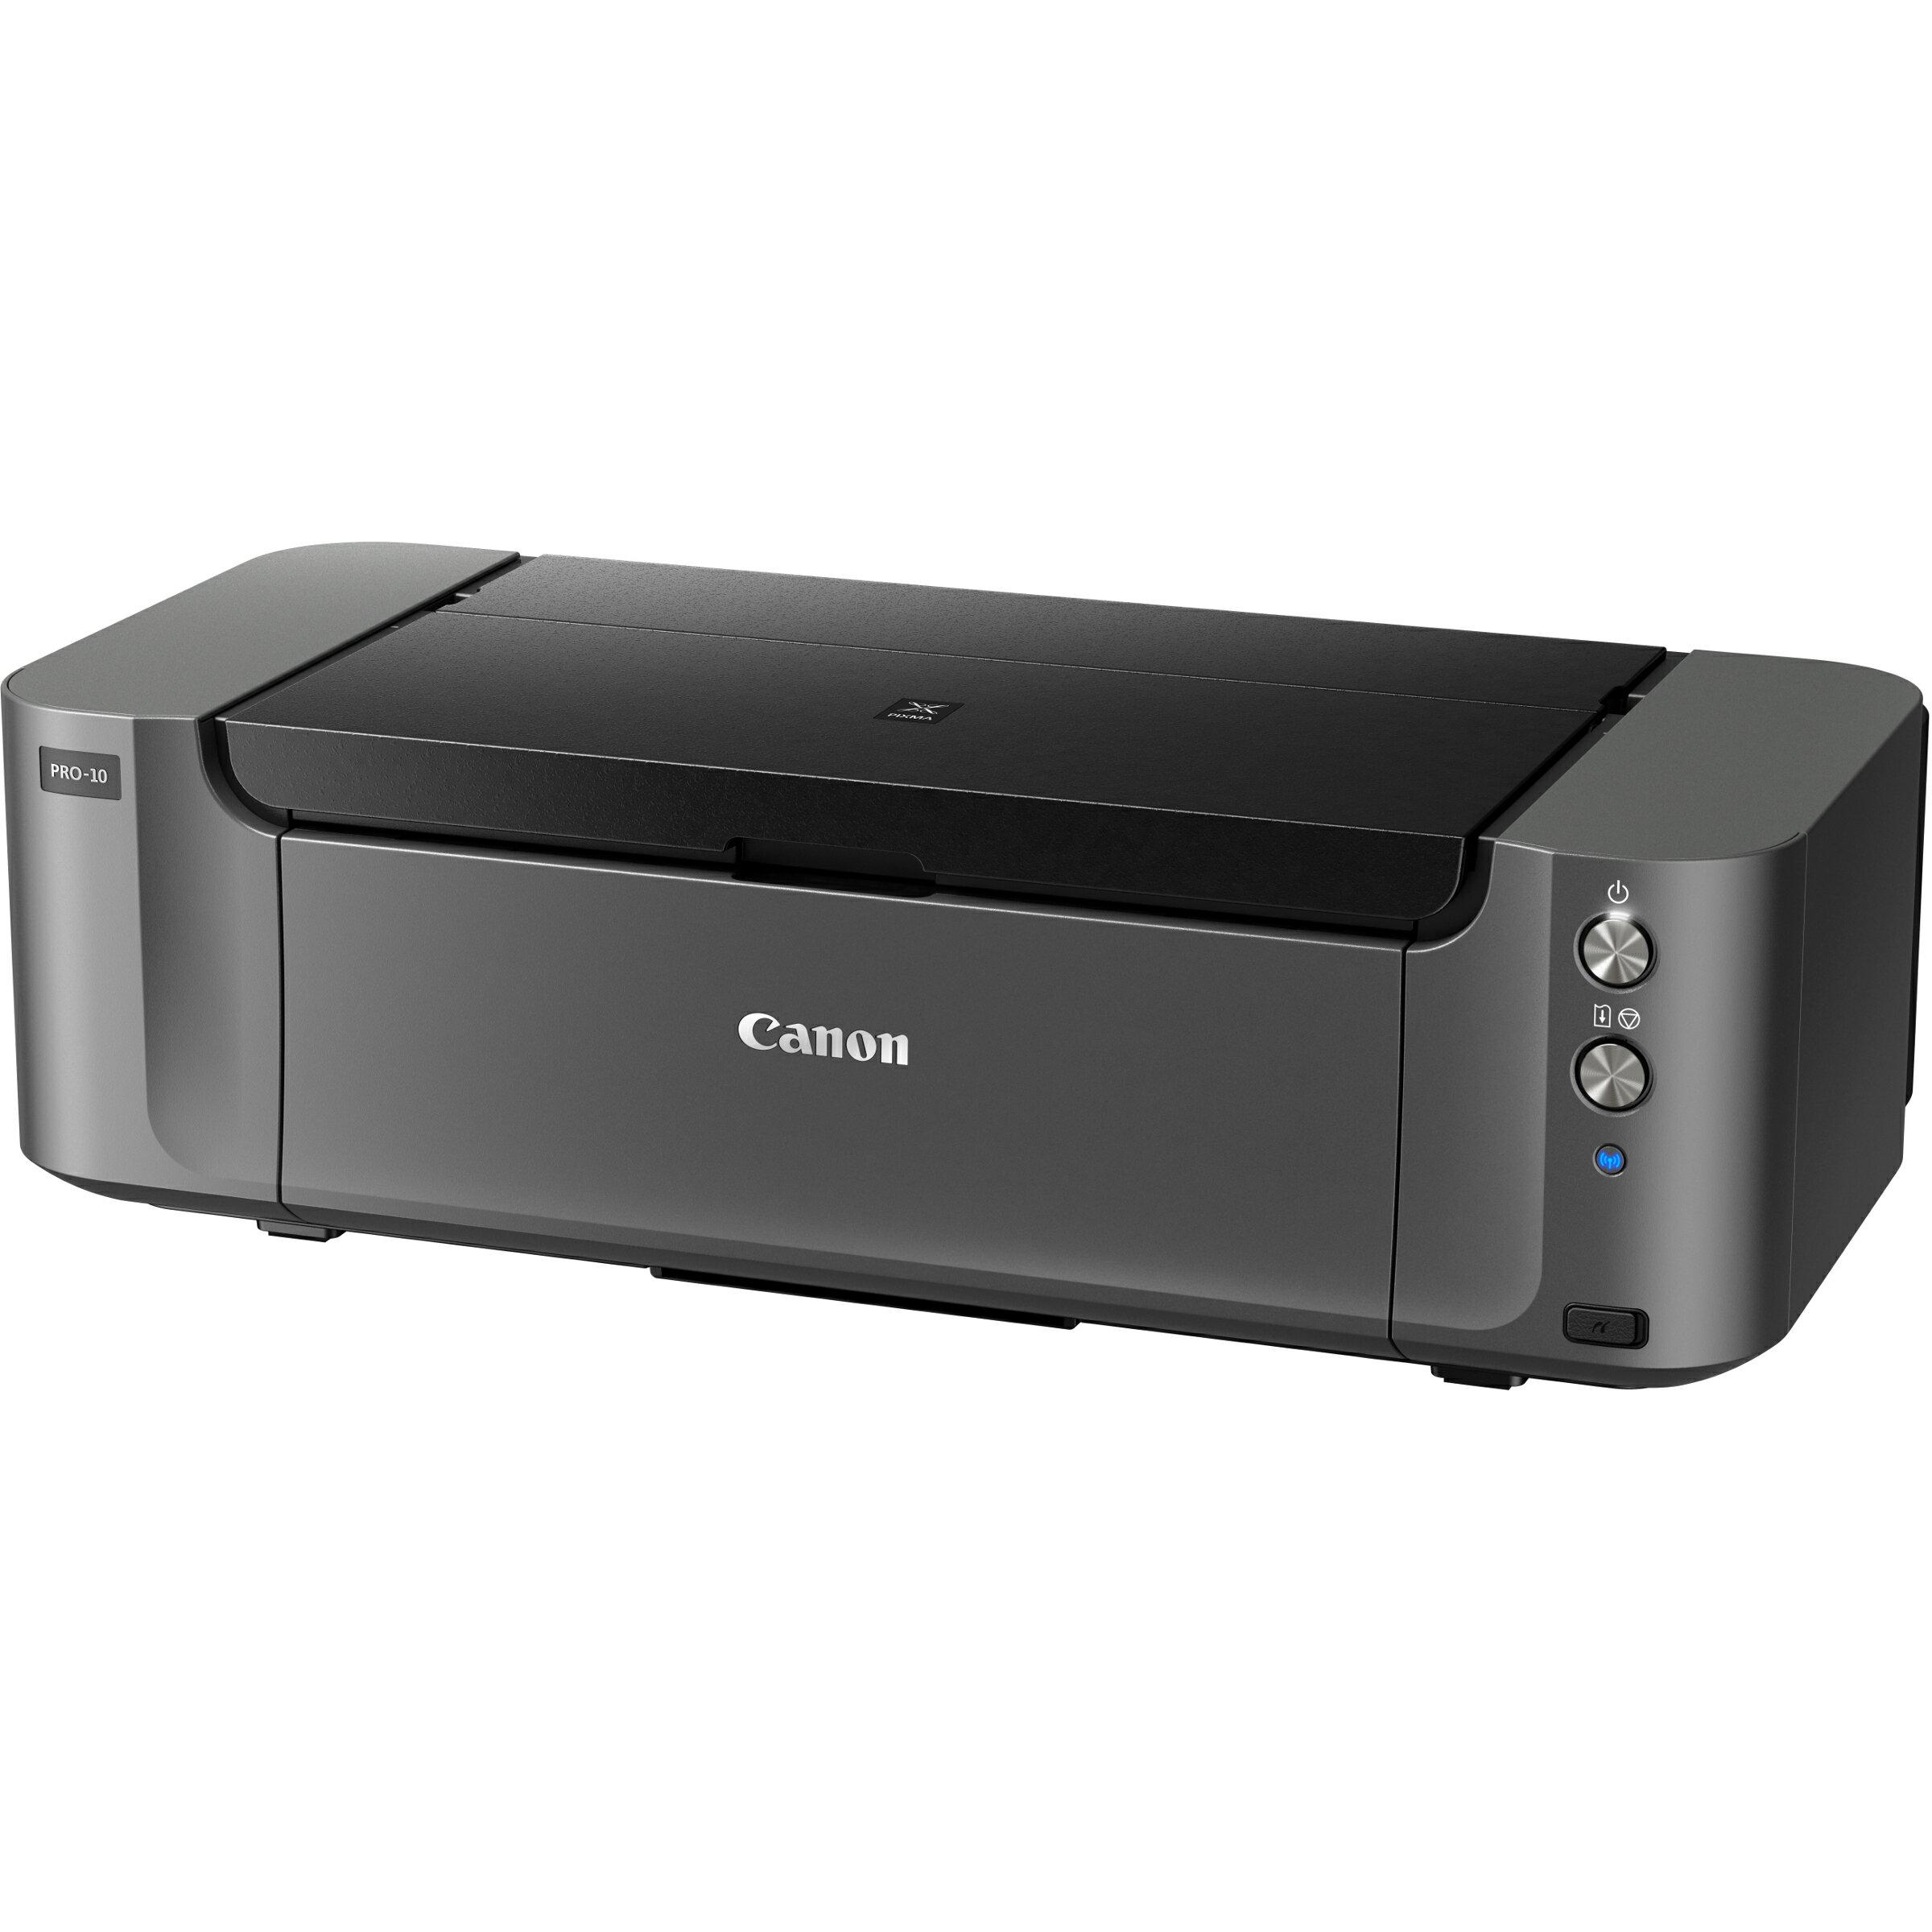 Canon PIXMA Pro PRO-10 Inkjet Printer - Color - 4800 x 2400 dpi Print - Photo/Disc Print - Desktop - 3.6 Second Photo - 150 sheets Standard Input Capacity - Ethernet - Wireless LAN - USB - PictBridge 2